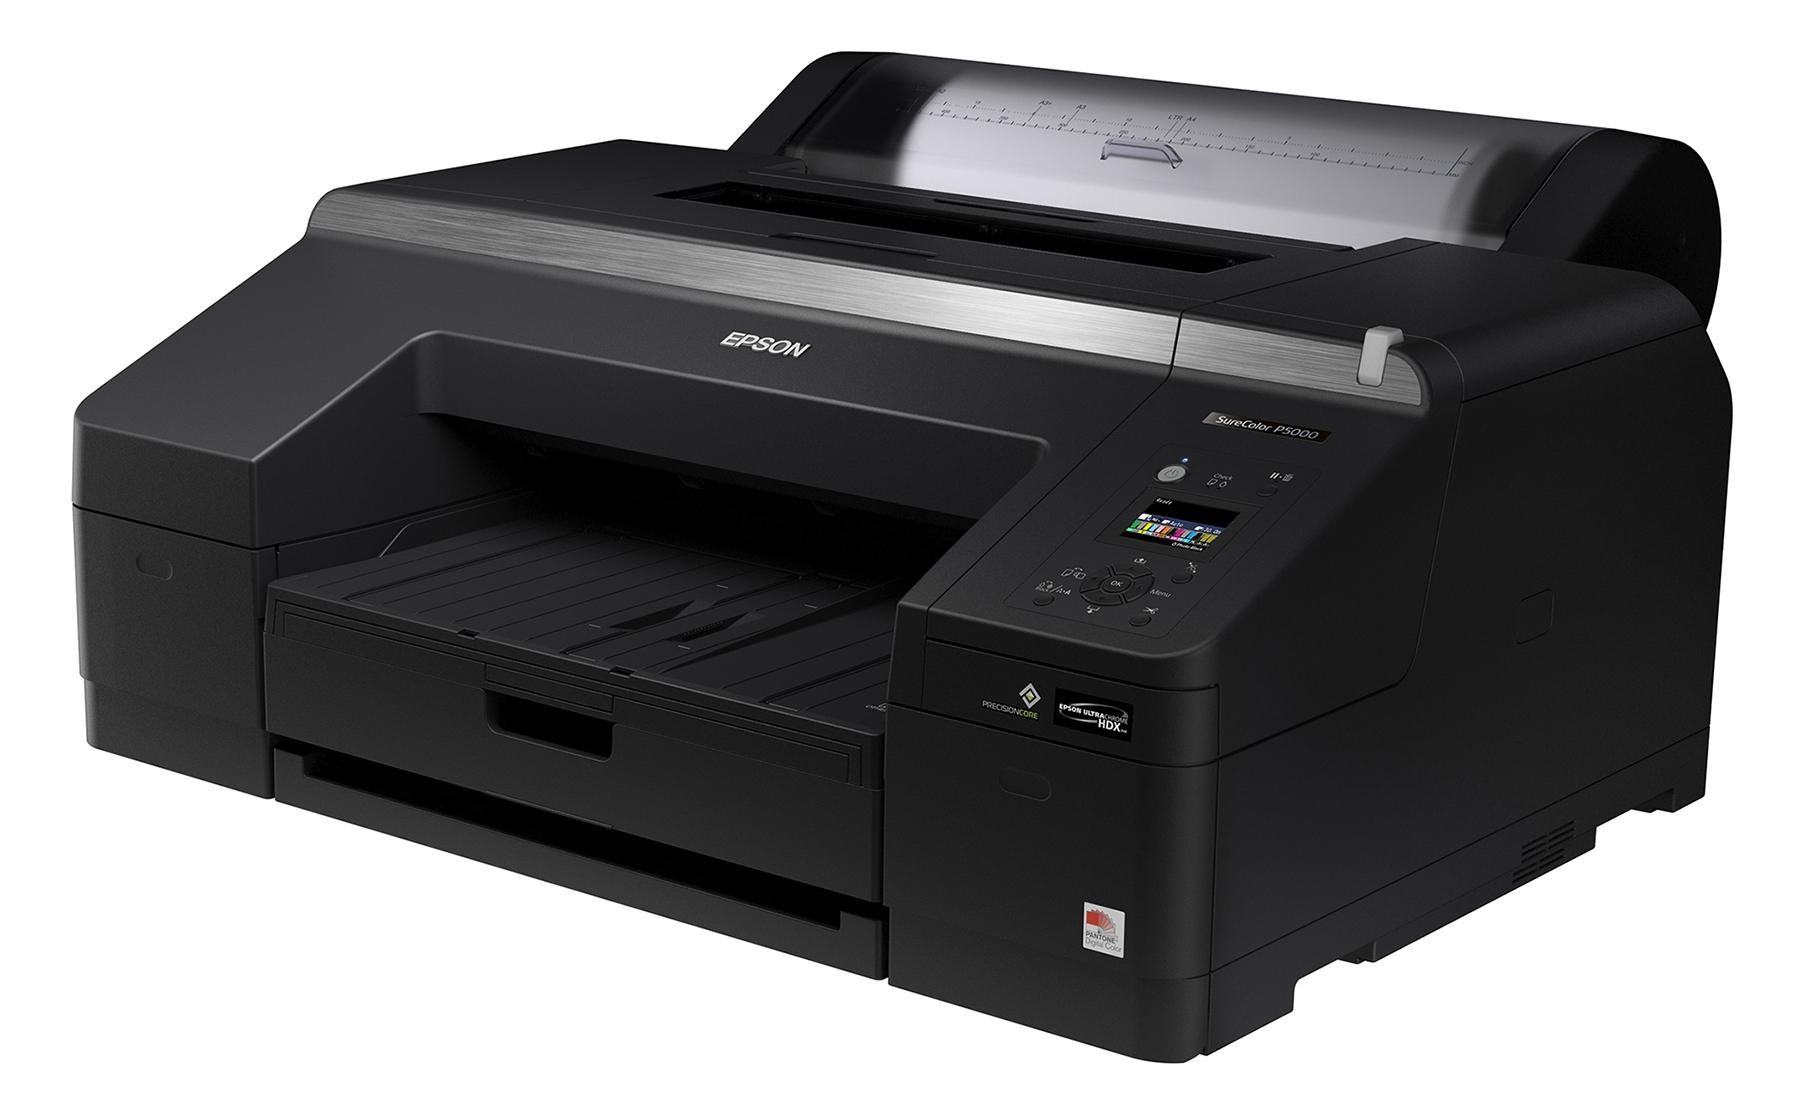 принтер формат